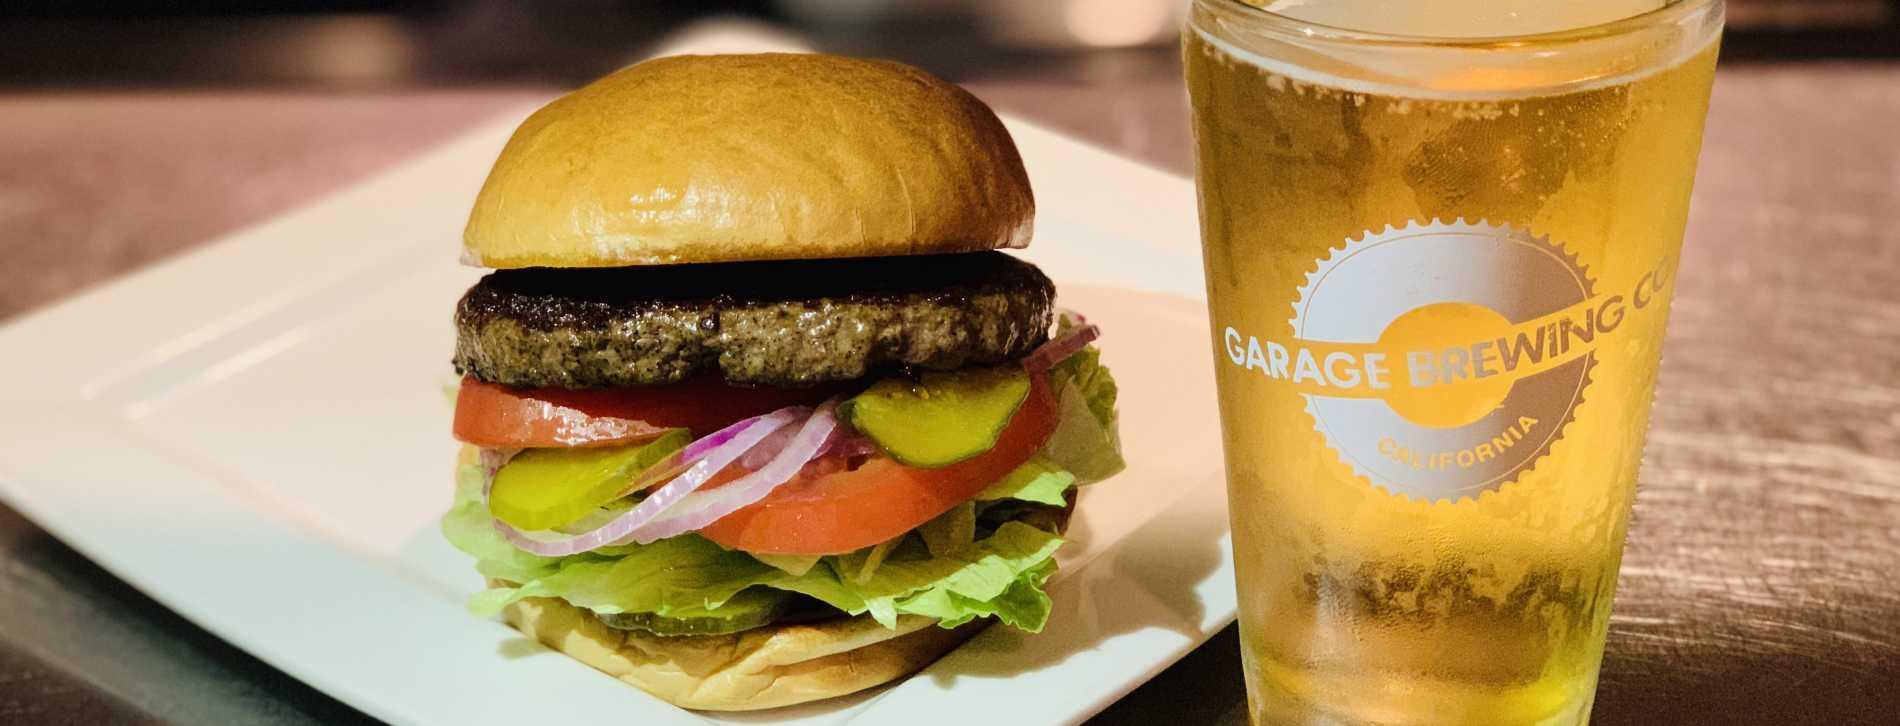 Monday Special Burger & Beer $10